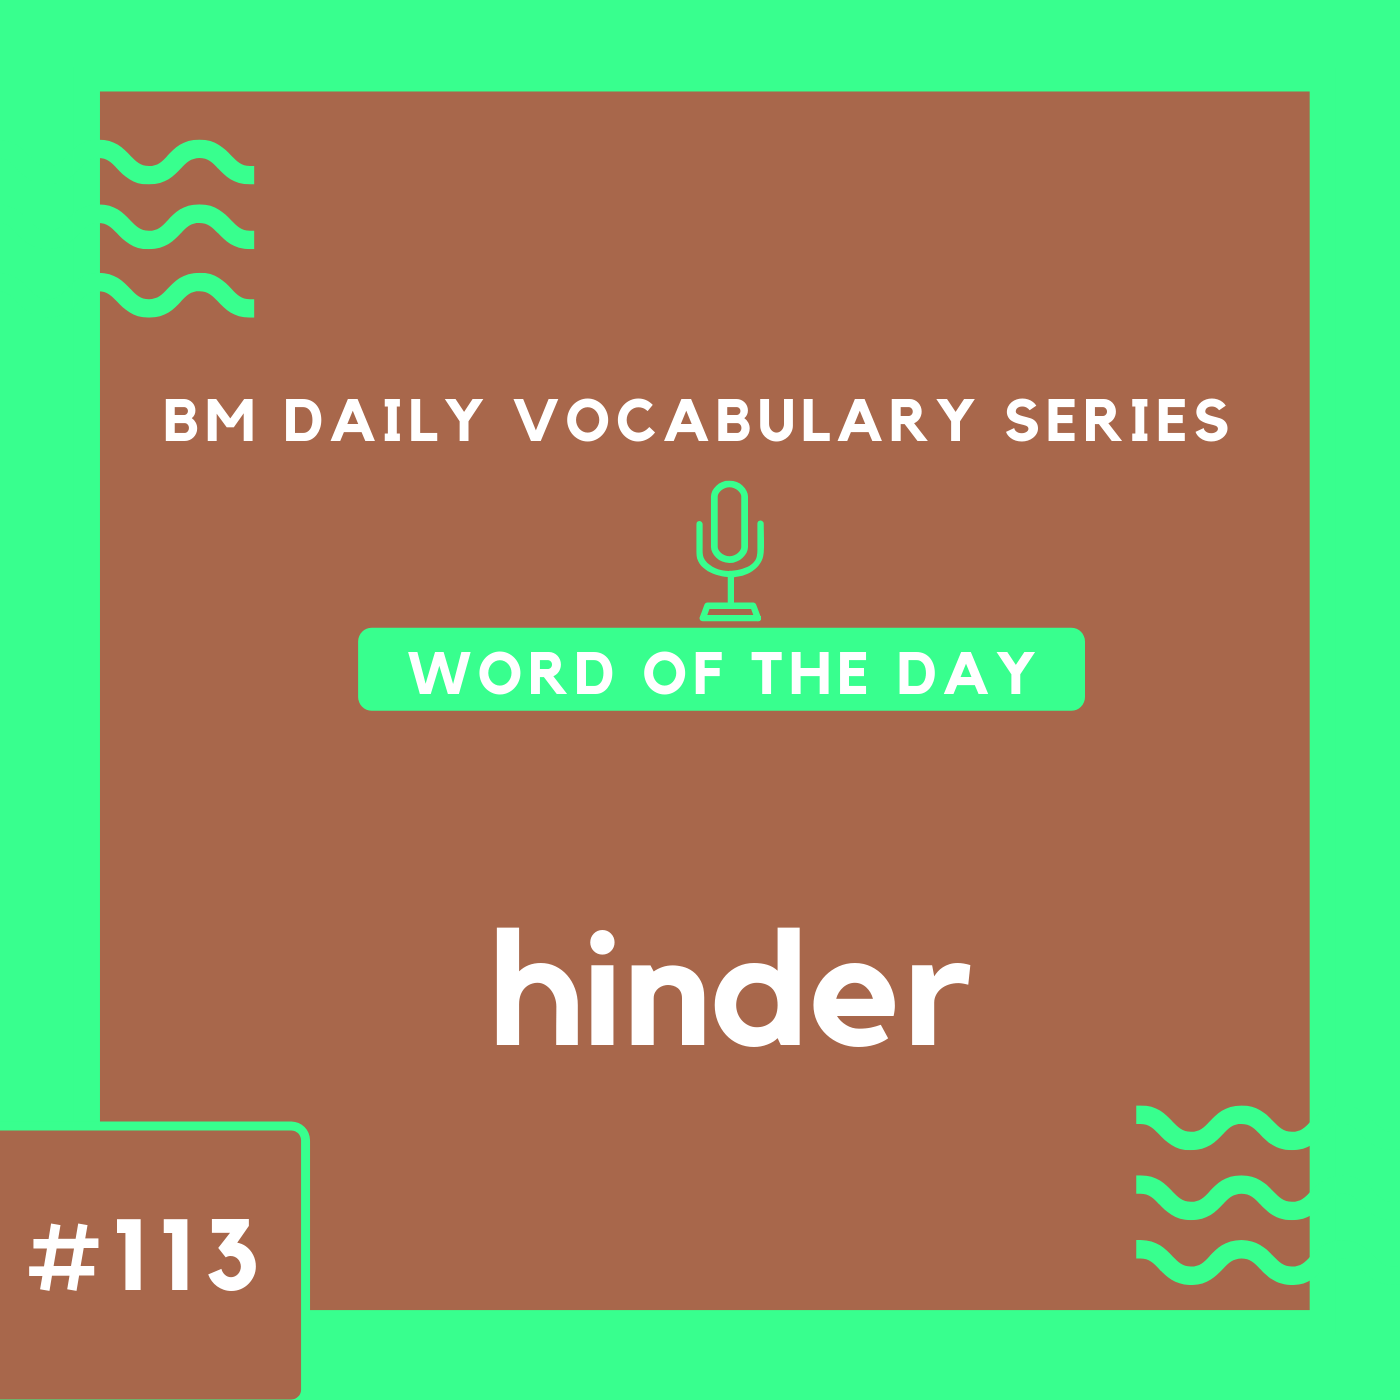 200 BM Daily Vocabulary #113   hinder